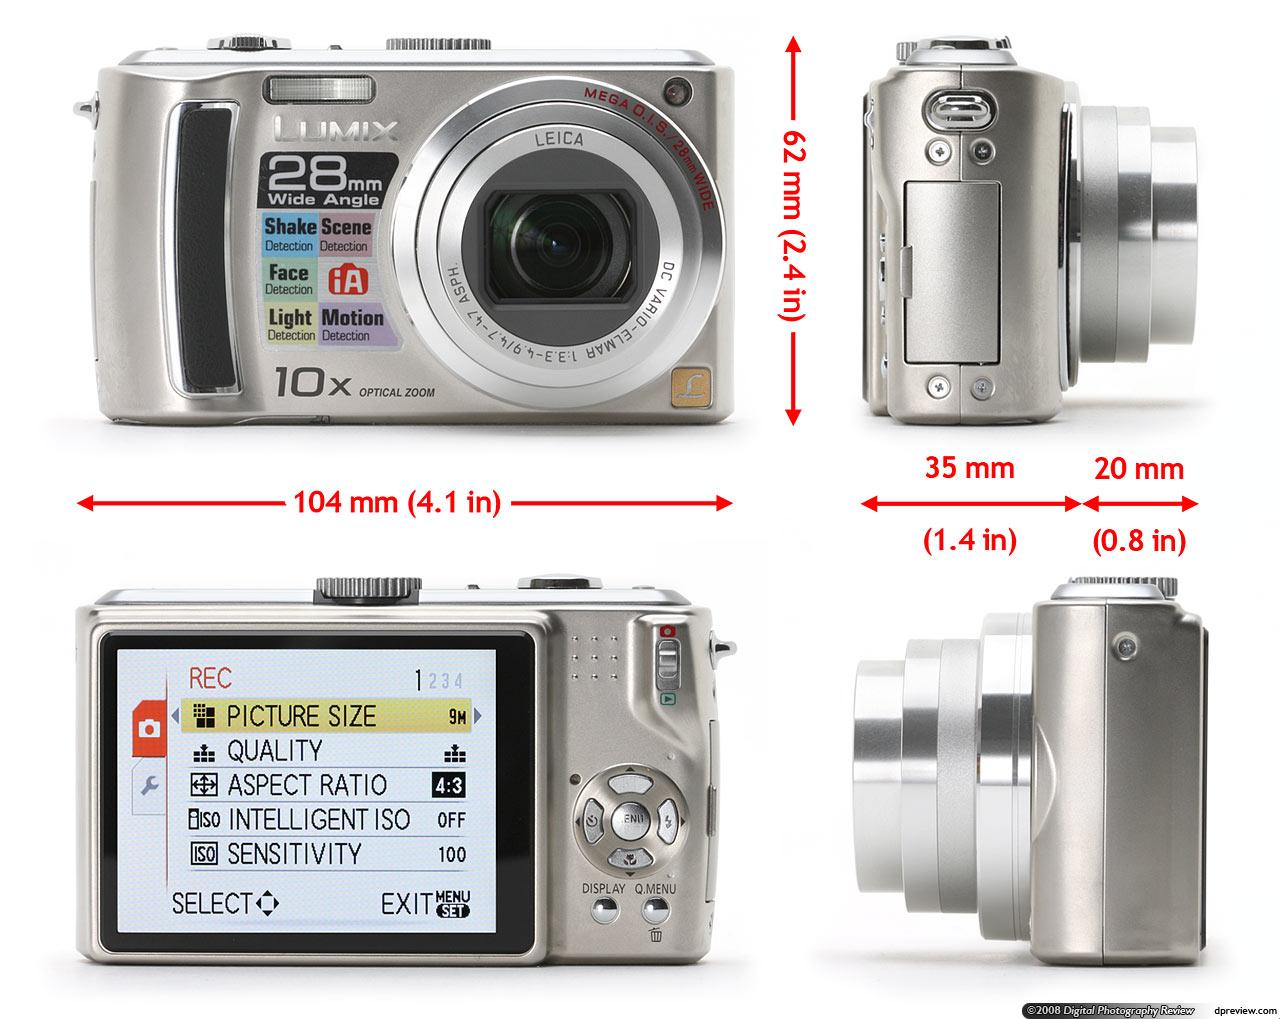 panasonic lumix dmc tz5 concise review digital photography review rh dpreview com panasonic dmc tz5 manuel d'utilisation panasonic dmc tz 55 manual